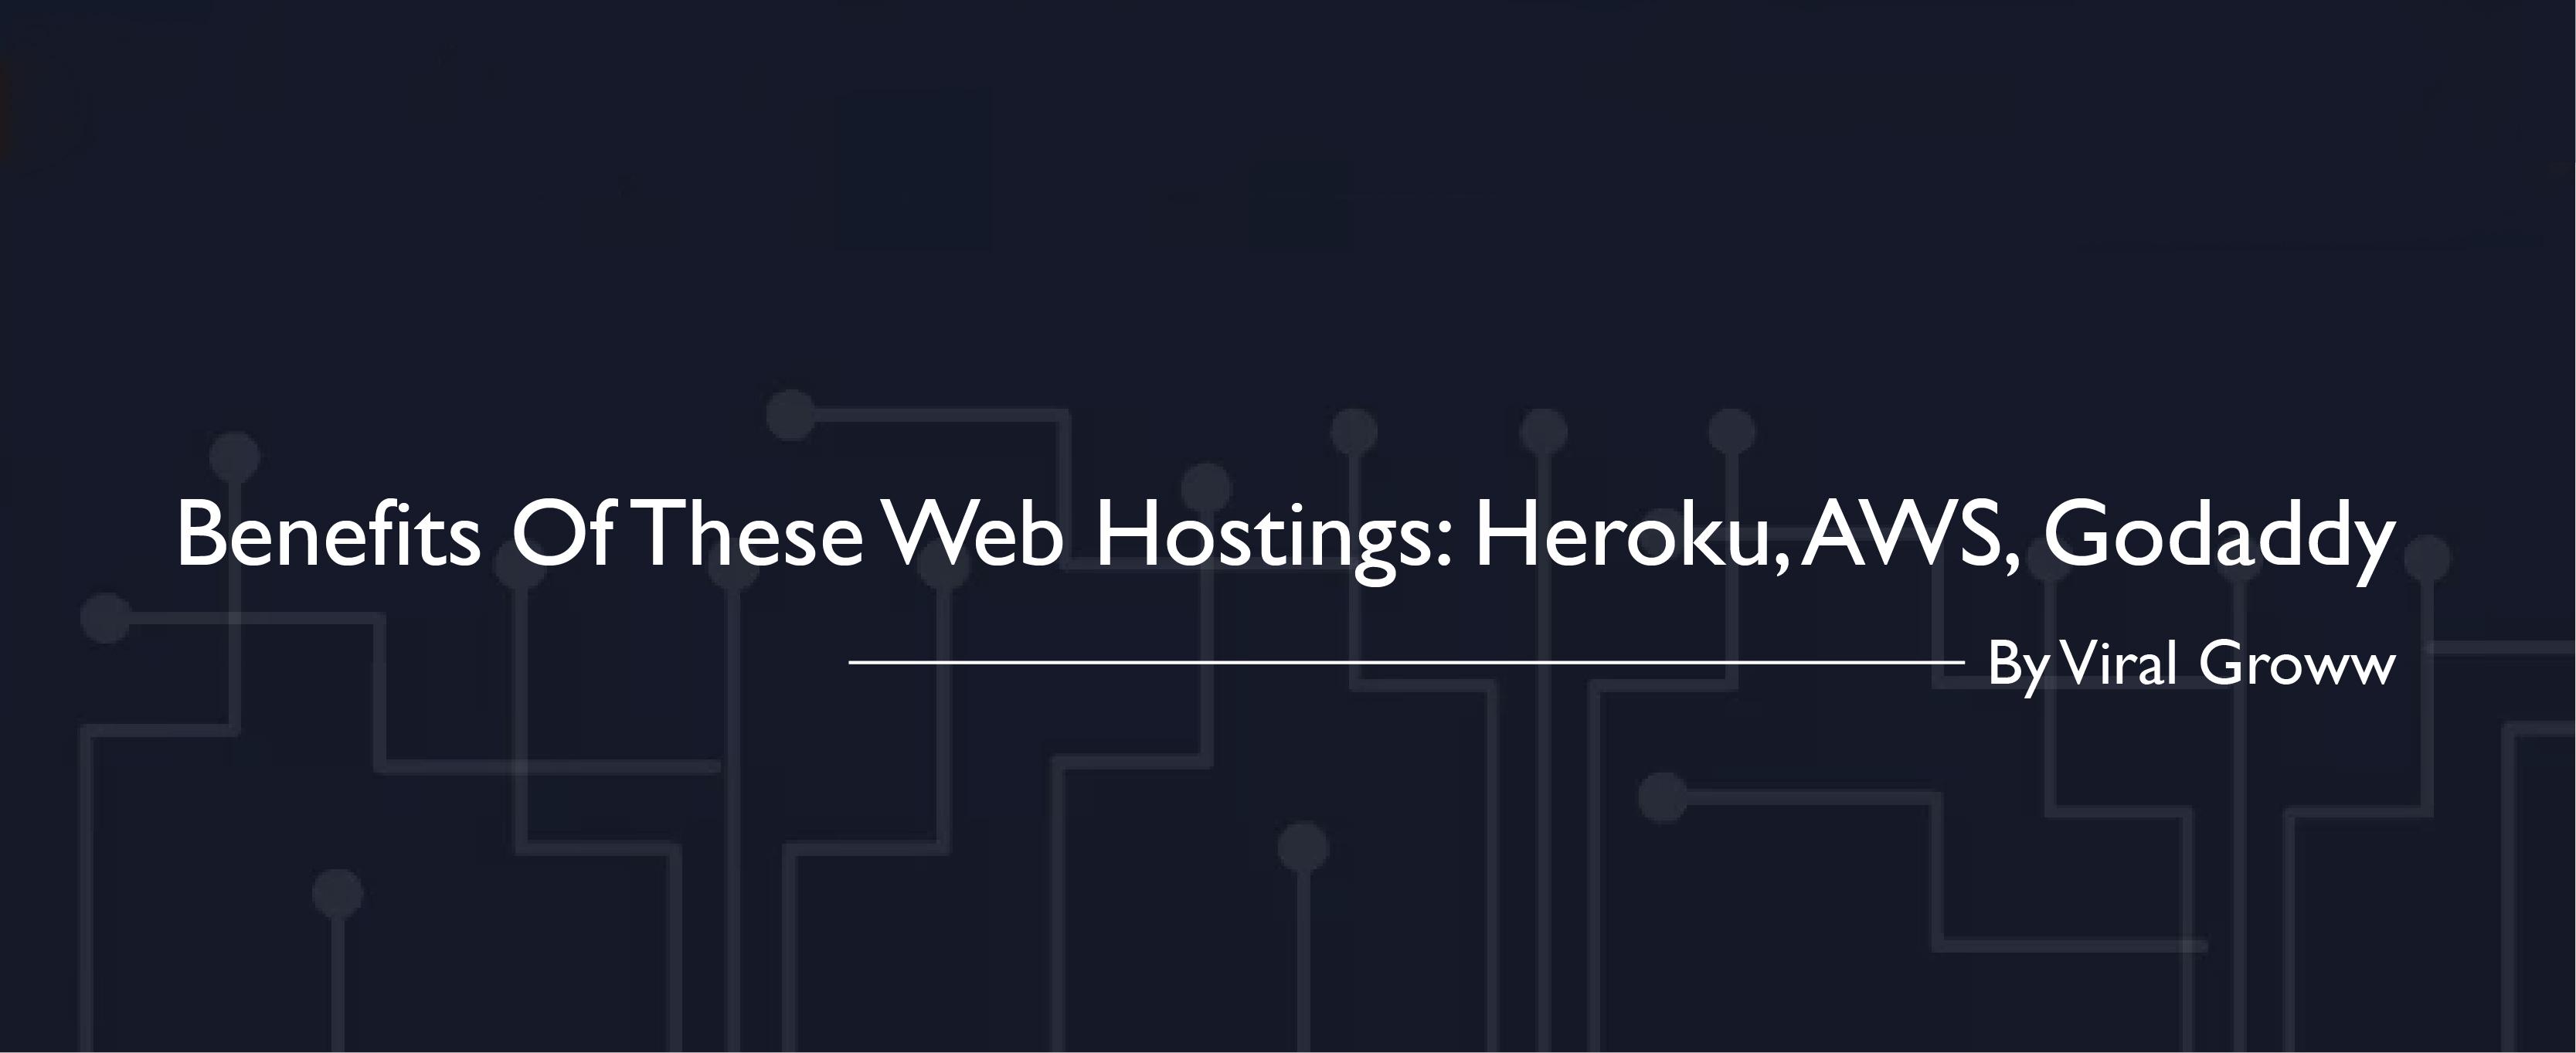 Benefits Of These Web Hostings: Heroku, AWS, Godaddy